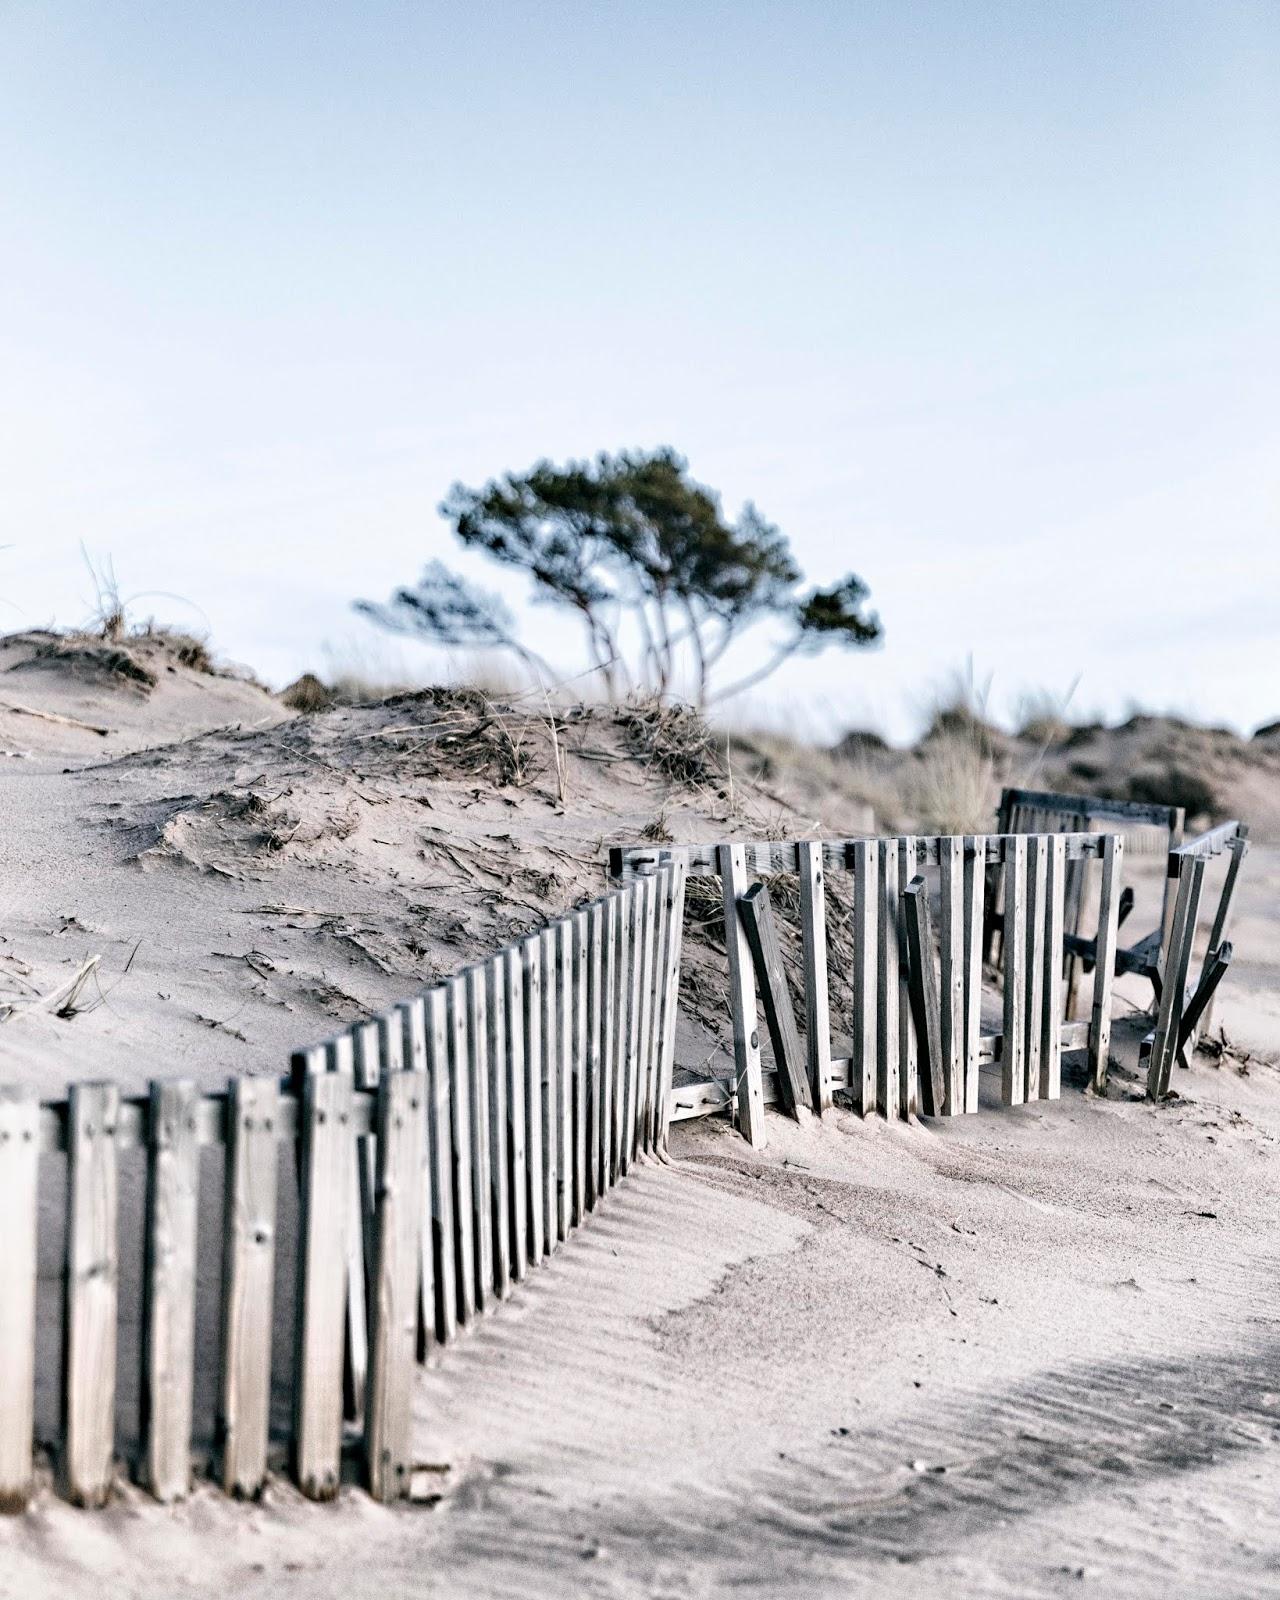 Pori, visit Pori, Satakunta, Suomi, Finland, finlandphotolovers, experience finland, discoverfinland, outdoors, outdoorphotography, Visualaddict, valokuvaaja, Frida Steiner, photographer, visualaddictfrida, Yyteri, beach, ranta, talvi, dyynit